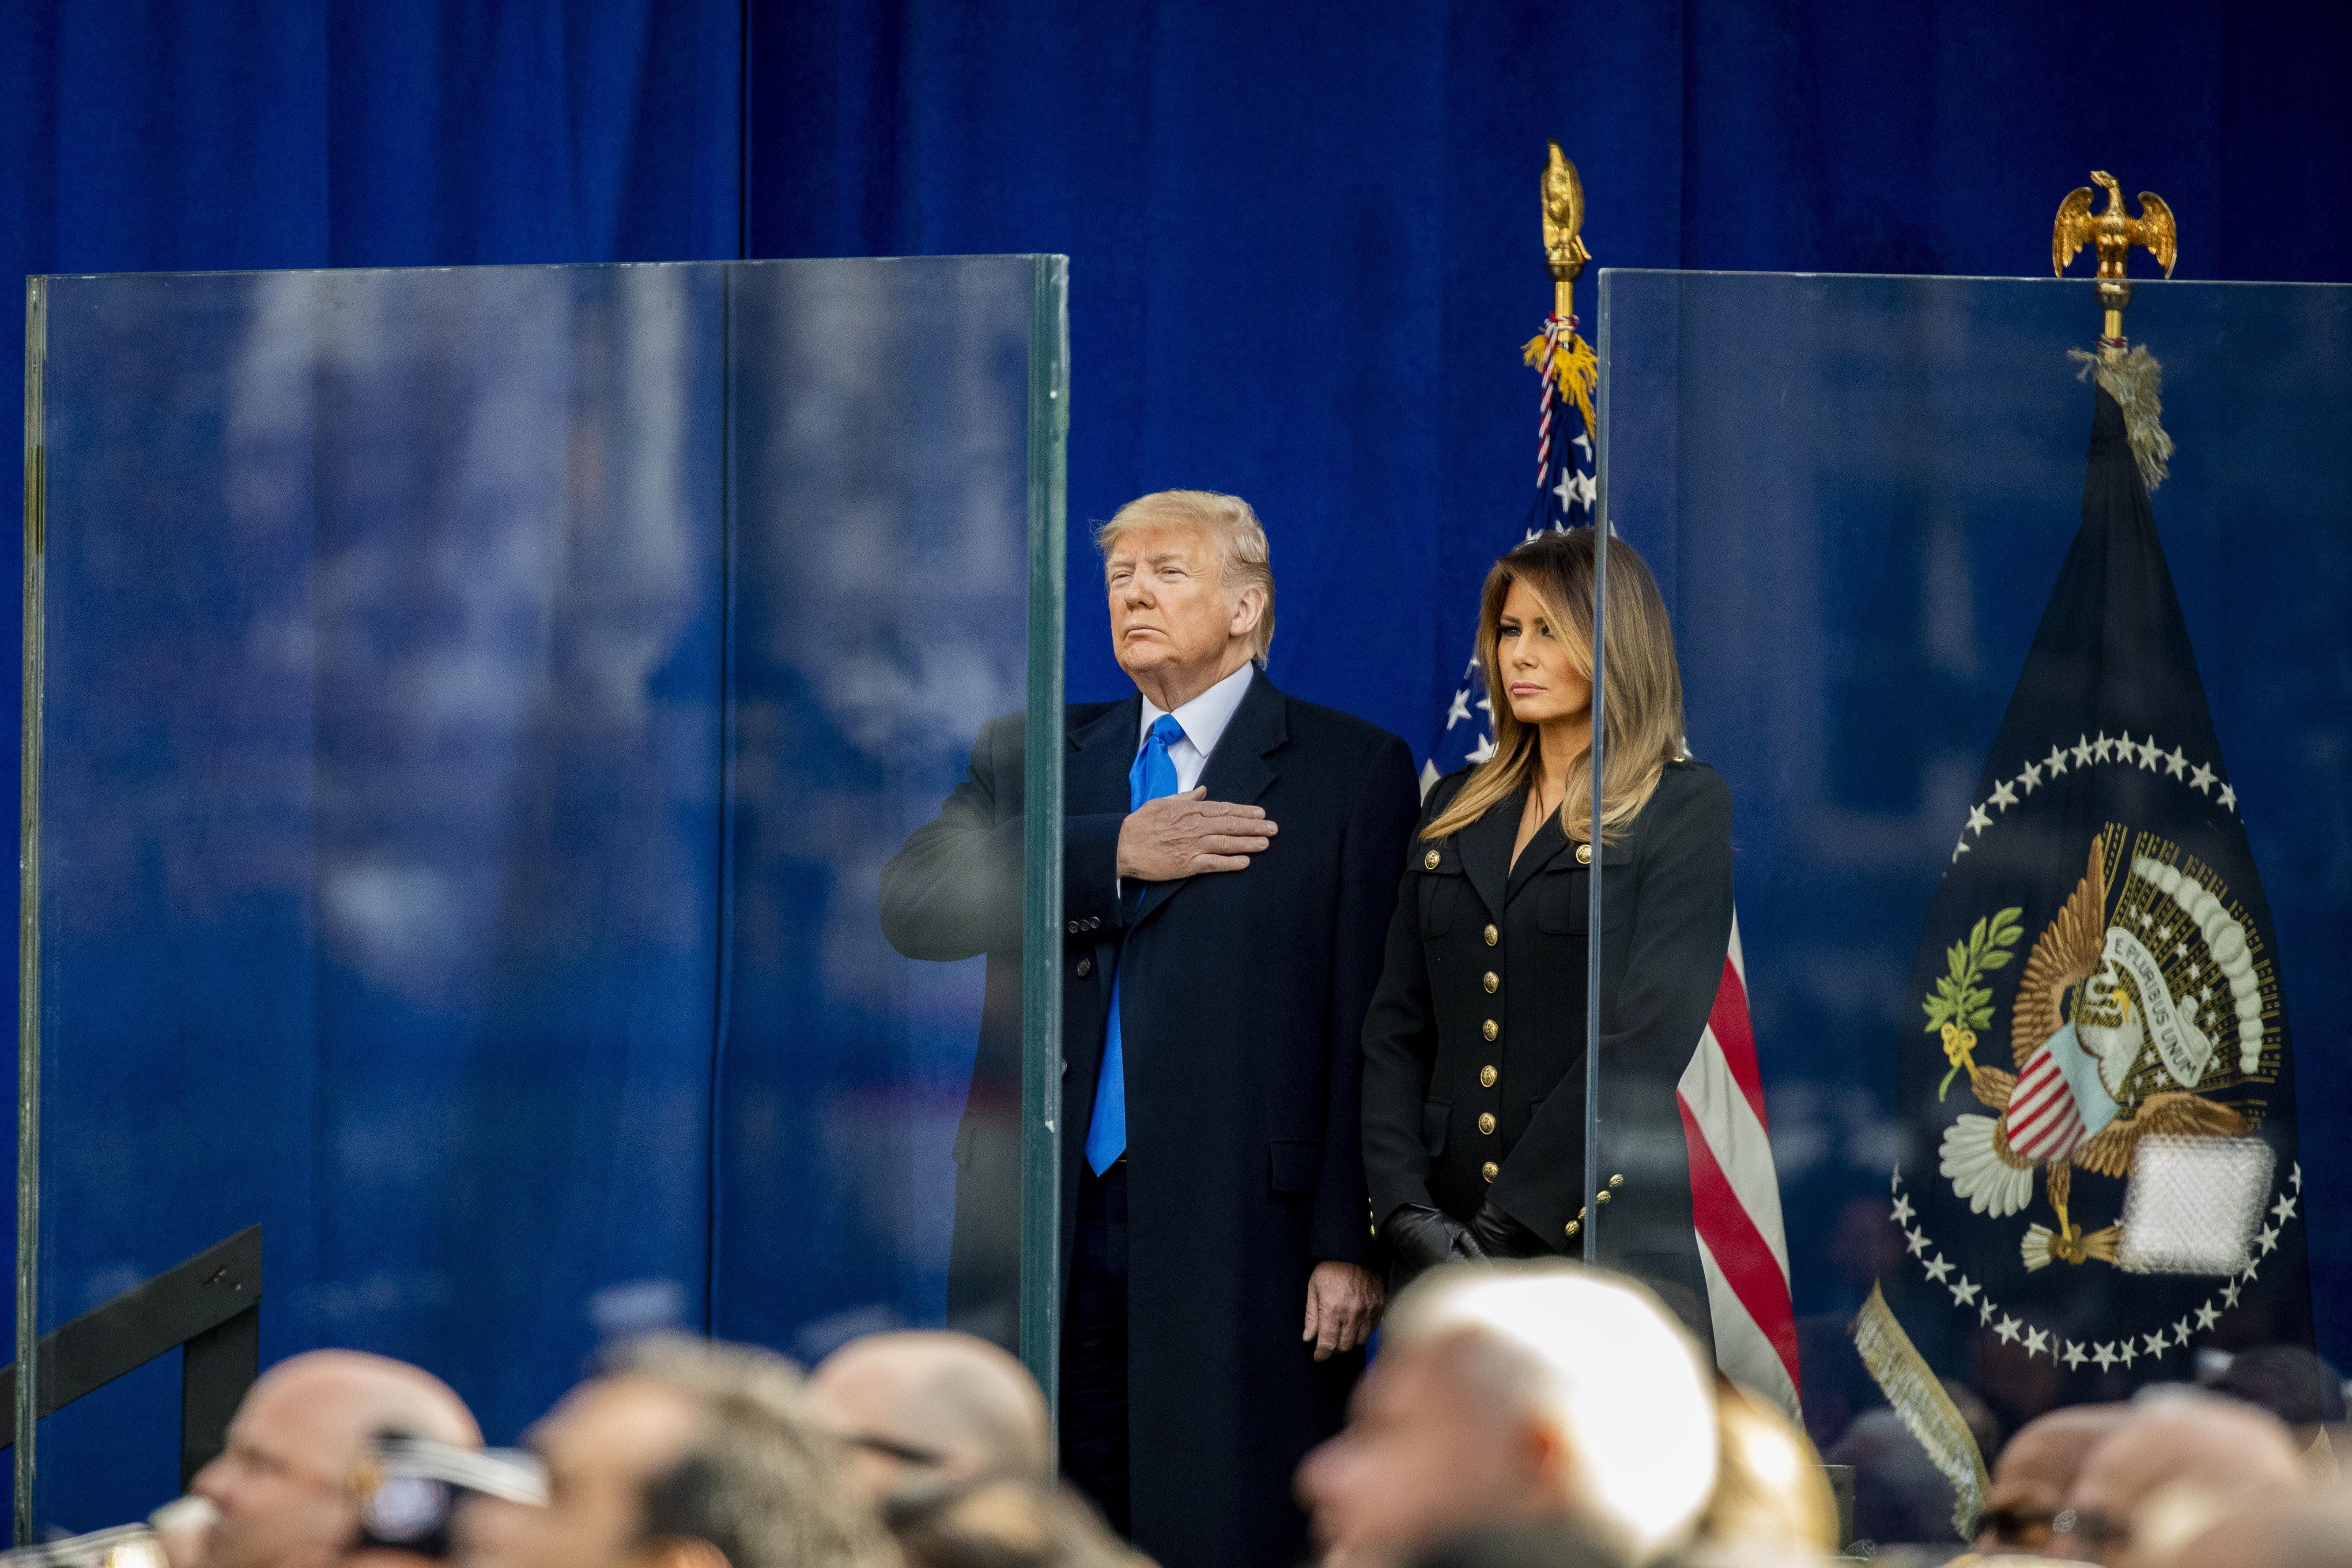 Jim Carrey Cartoon Rips 'Draft Dodger' Trump On Veterans Day